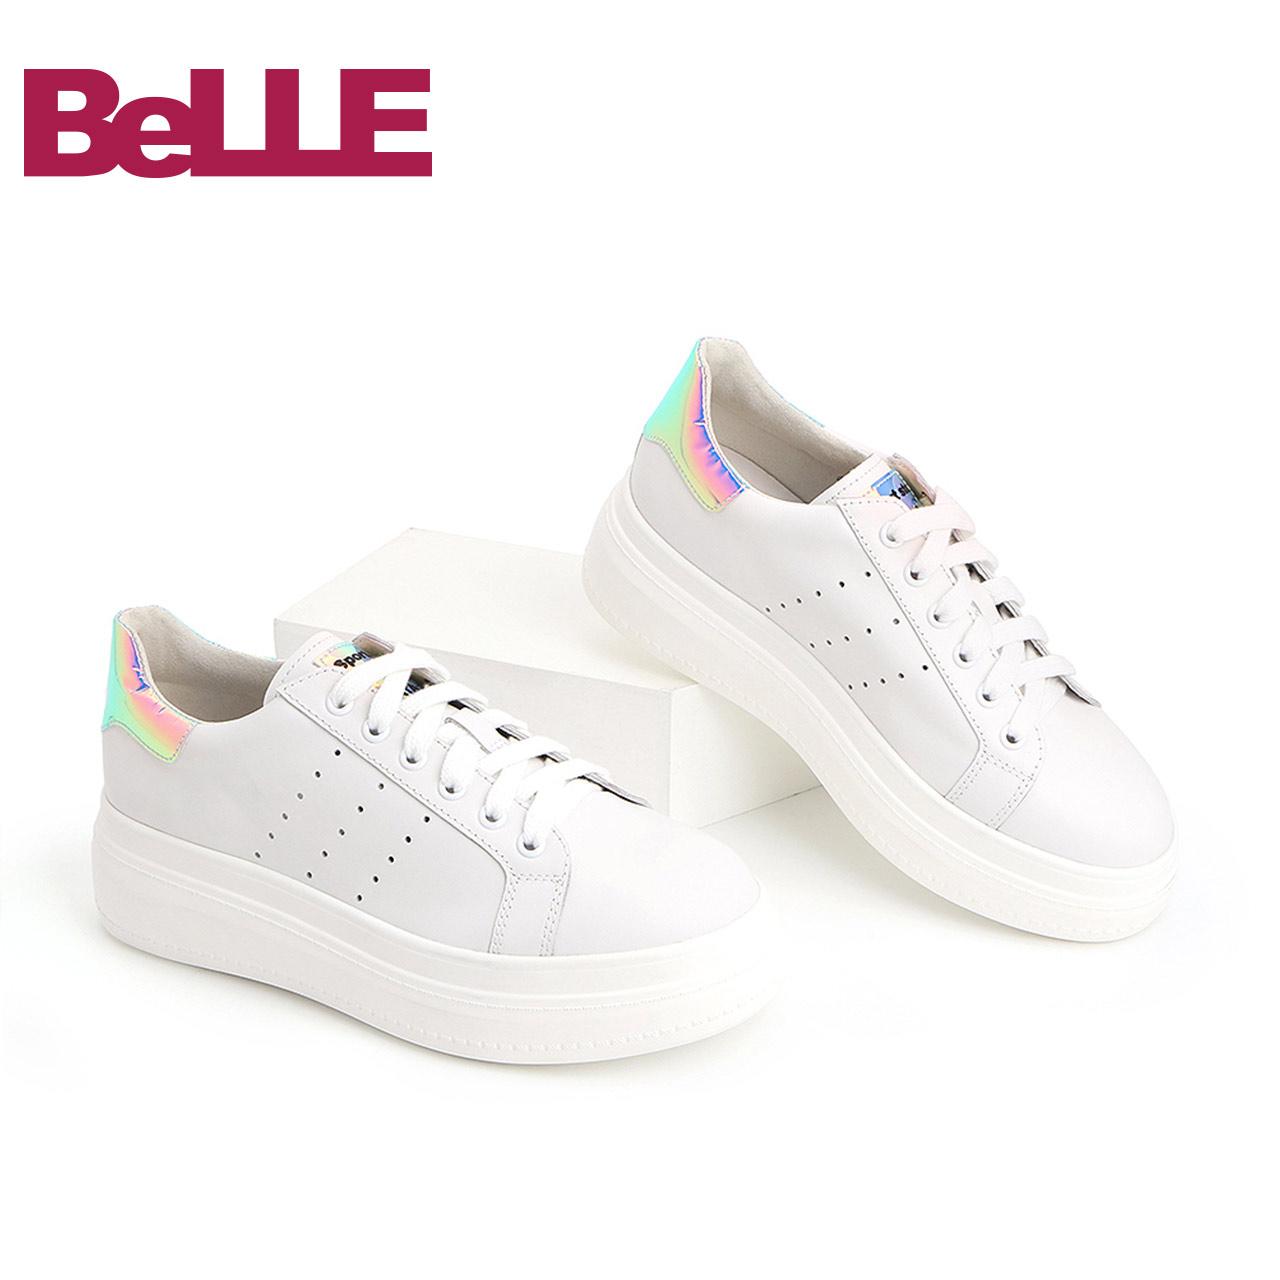 Belle-百丽小白鞋2018秋商场同款新款舒适休闲女鞋BYDA2CM8